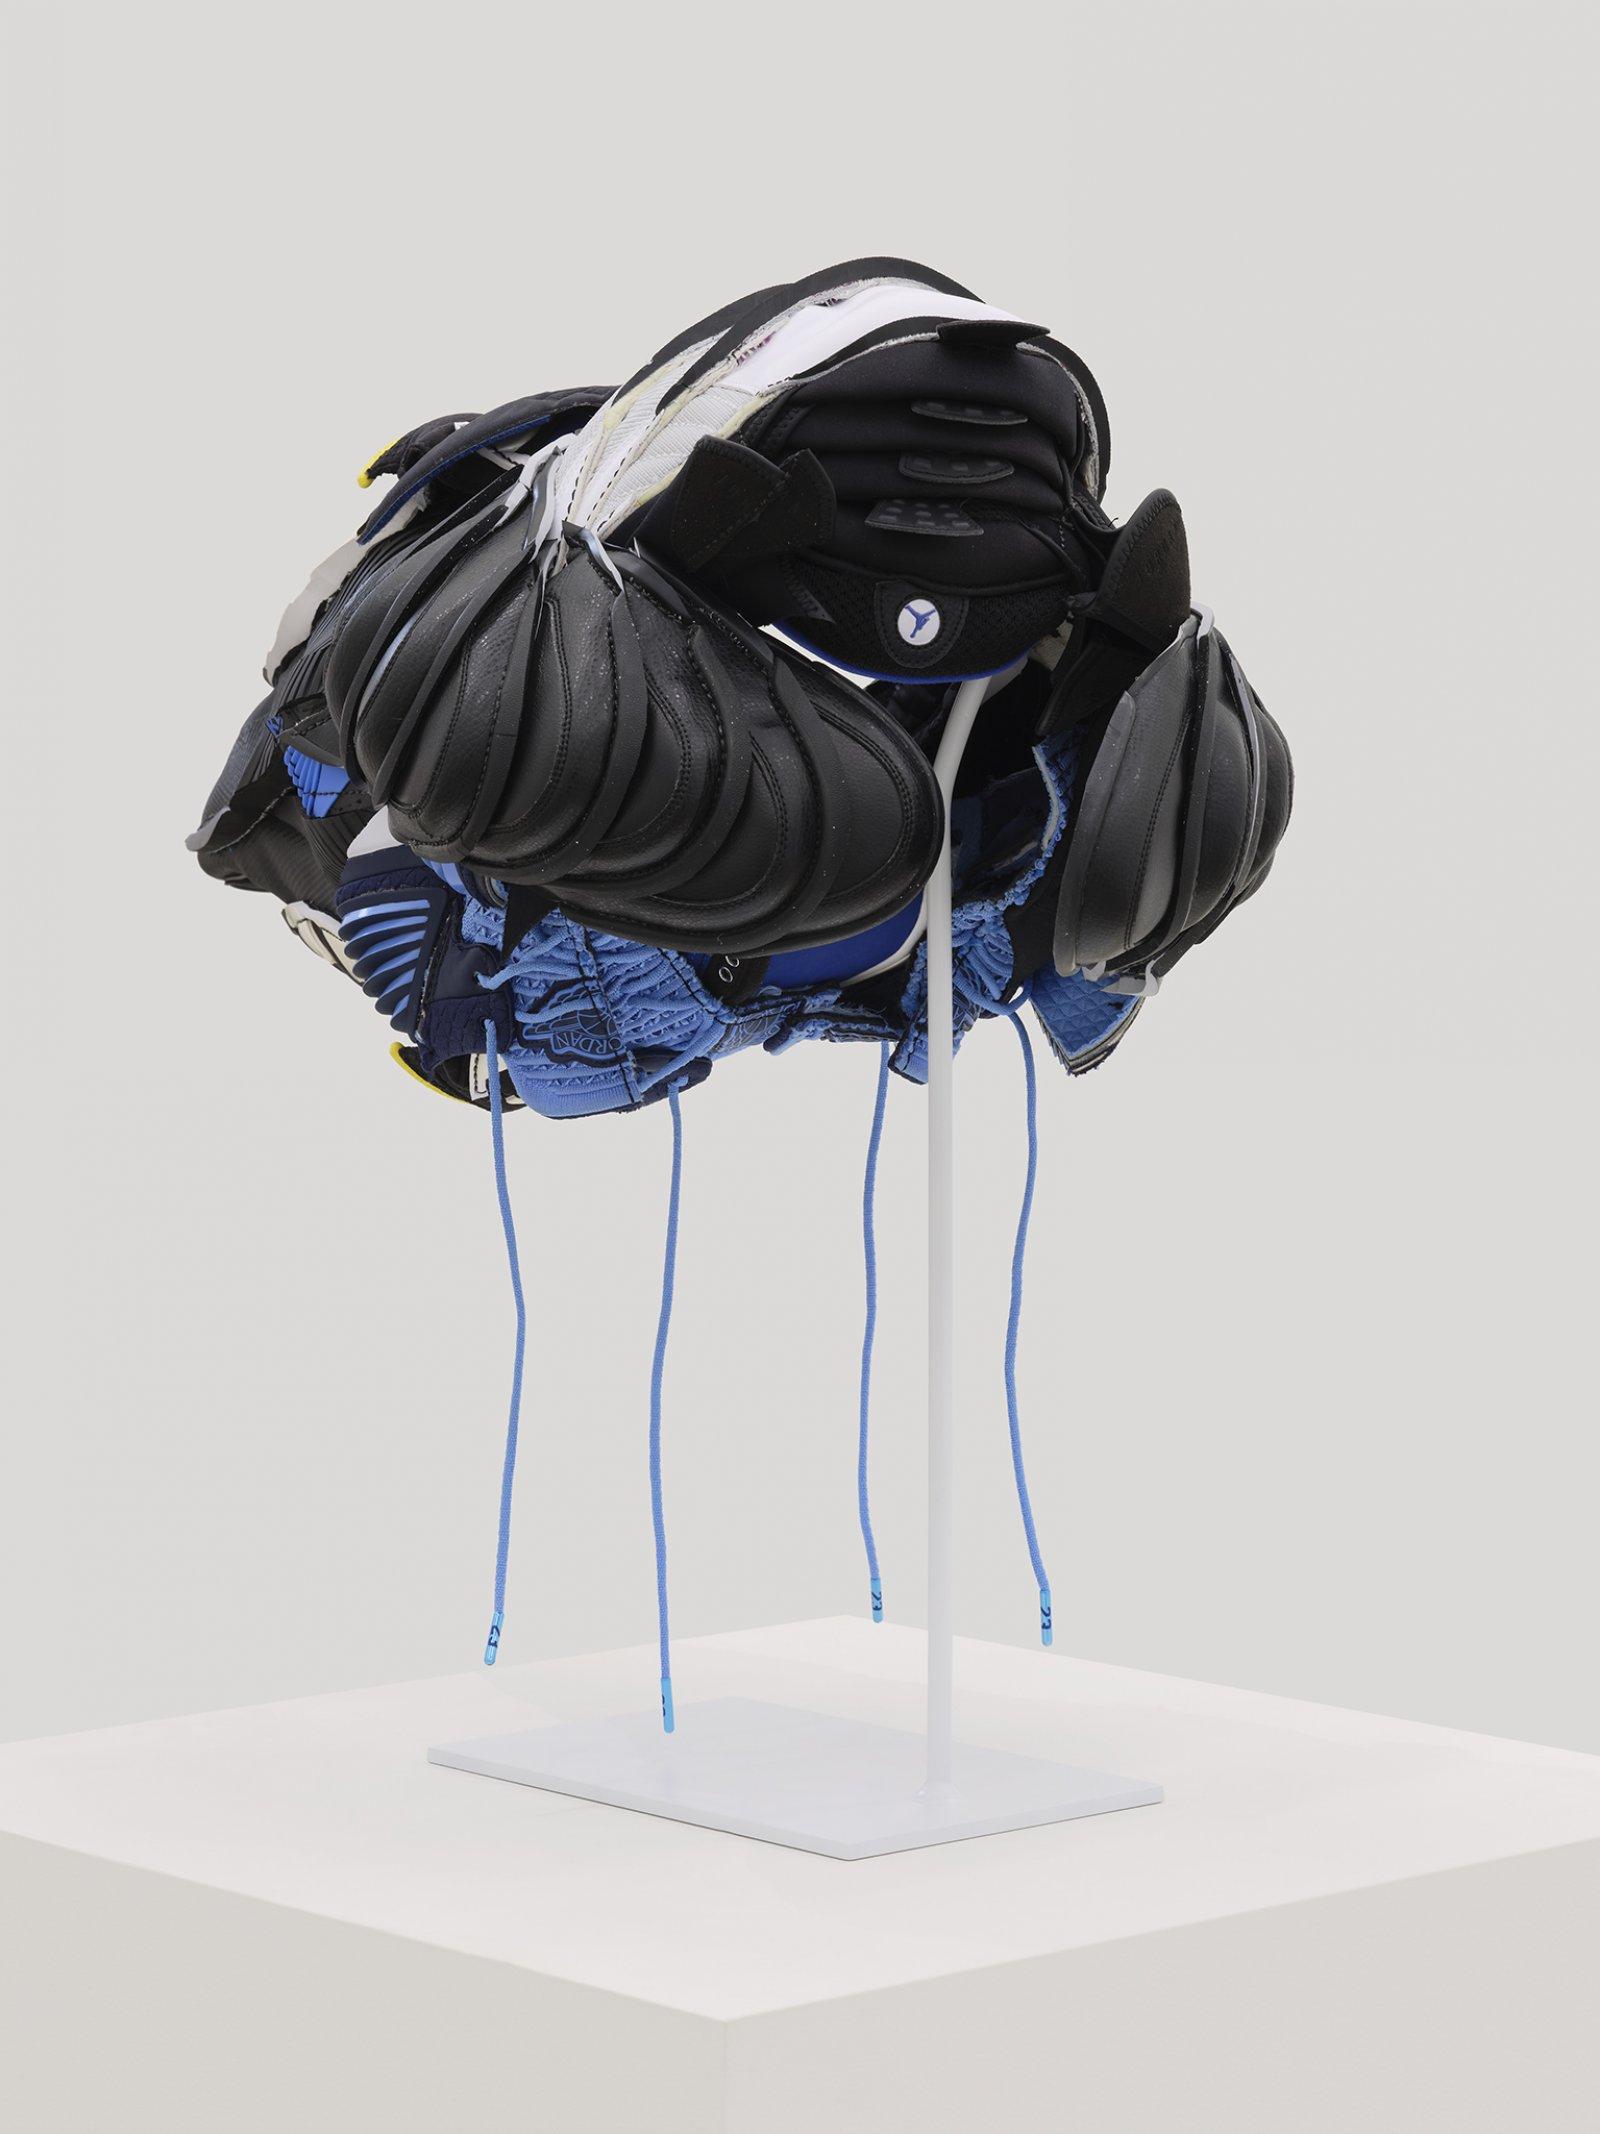 Brian Jungen, Plague Mask 2, 2020, nike air jordans, 12 x 23 x 15 in. (30 x 58 x 38 cm)